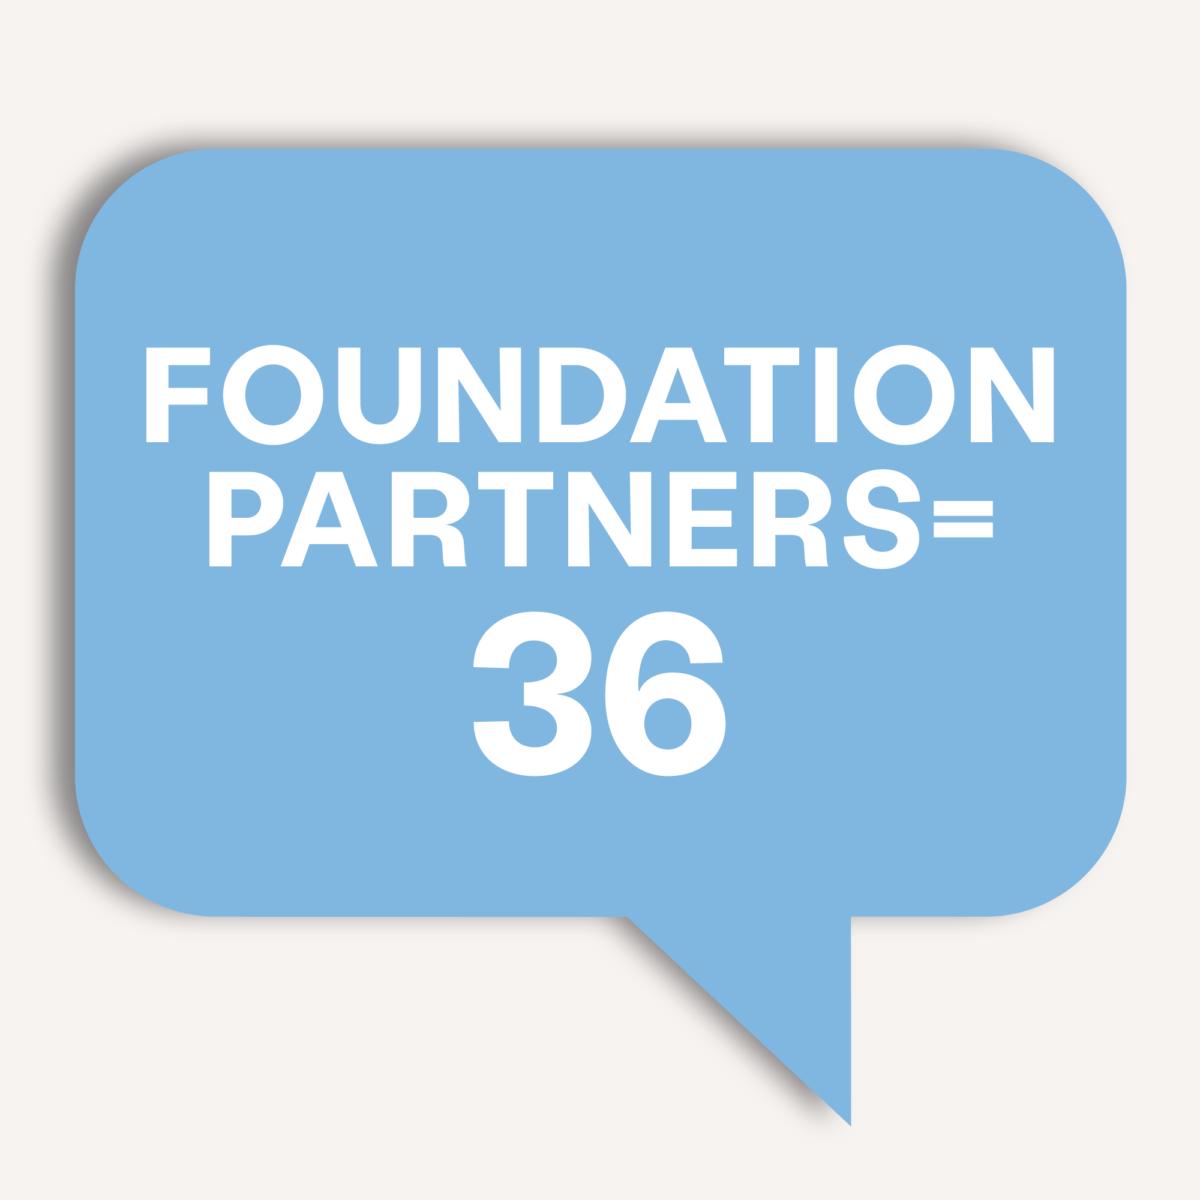 Foundation partners